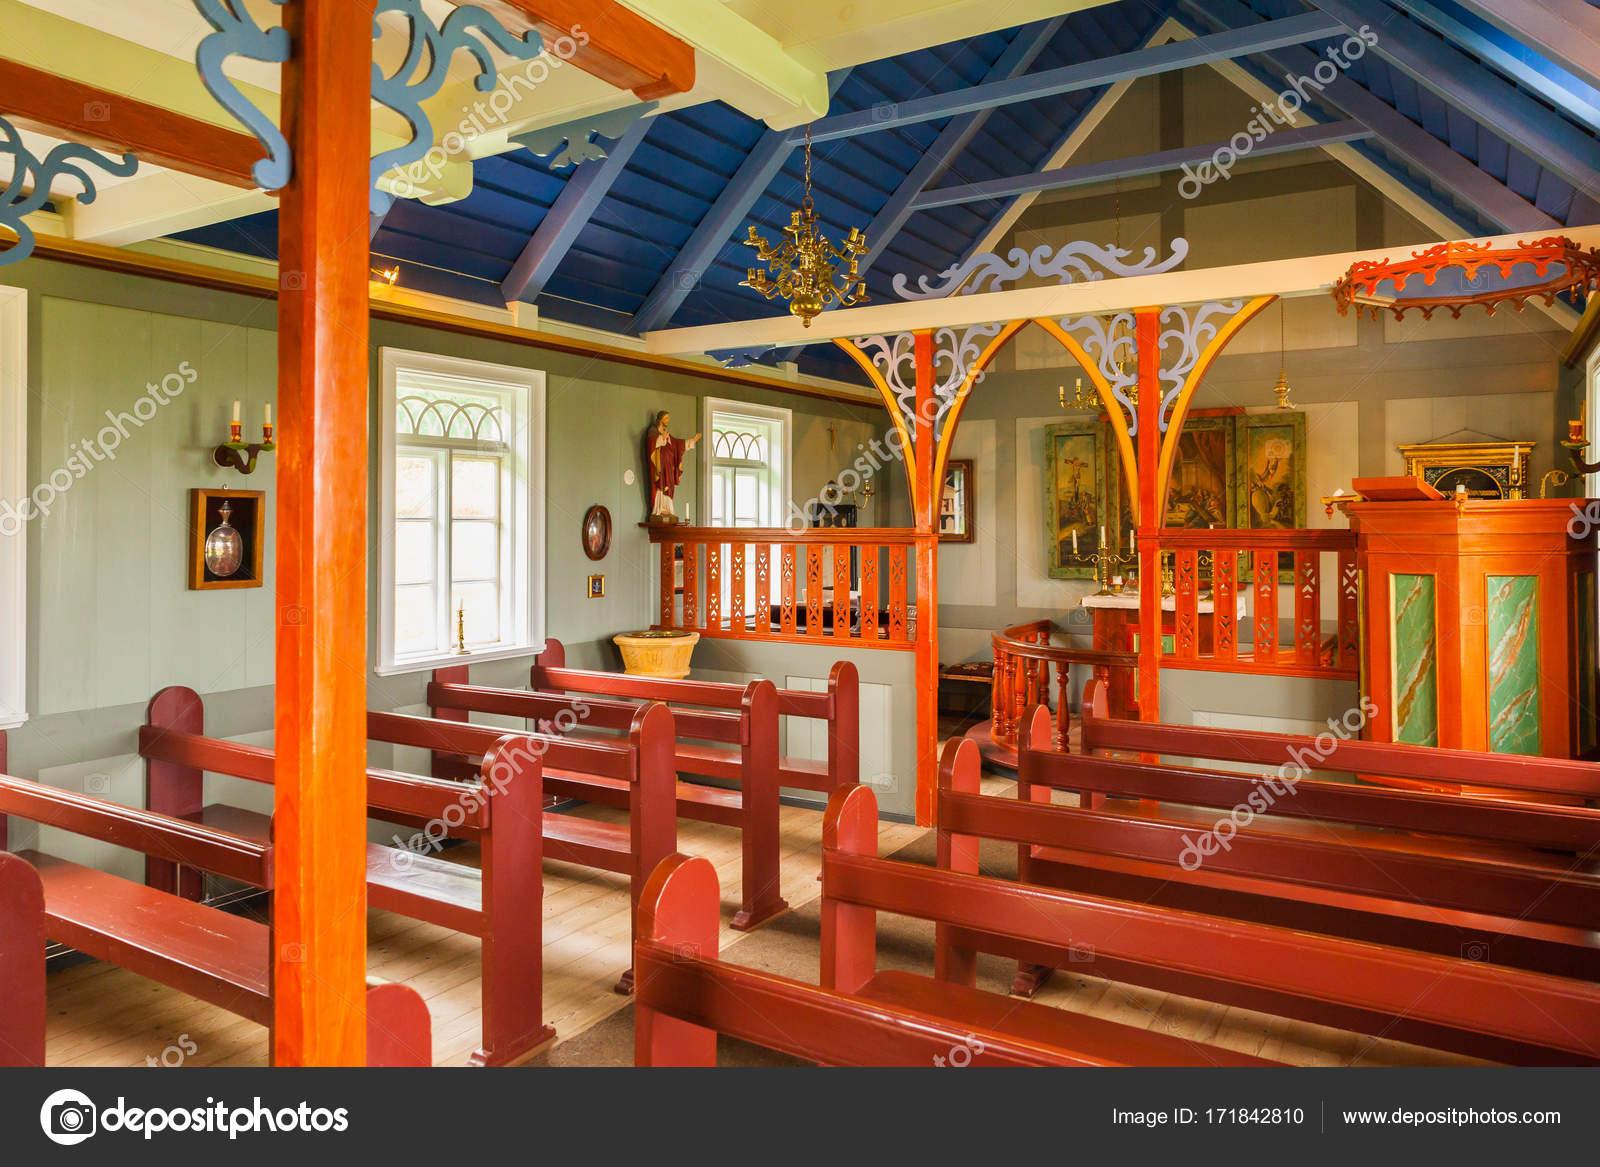 Iceland skogar museum church interiors — Stock Photo